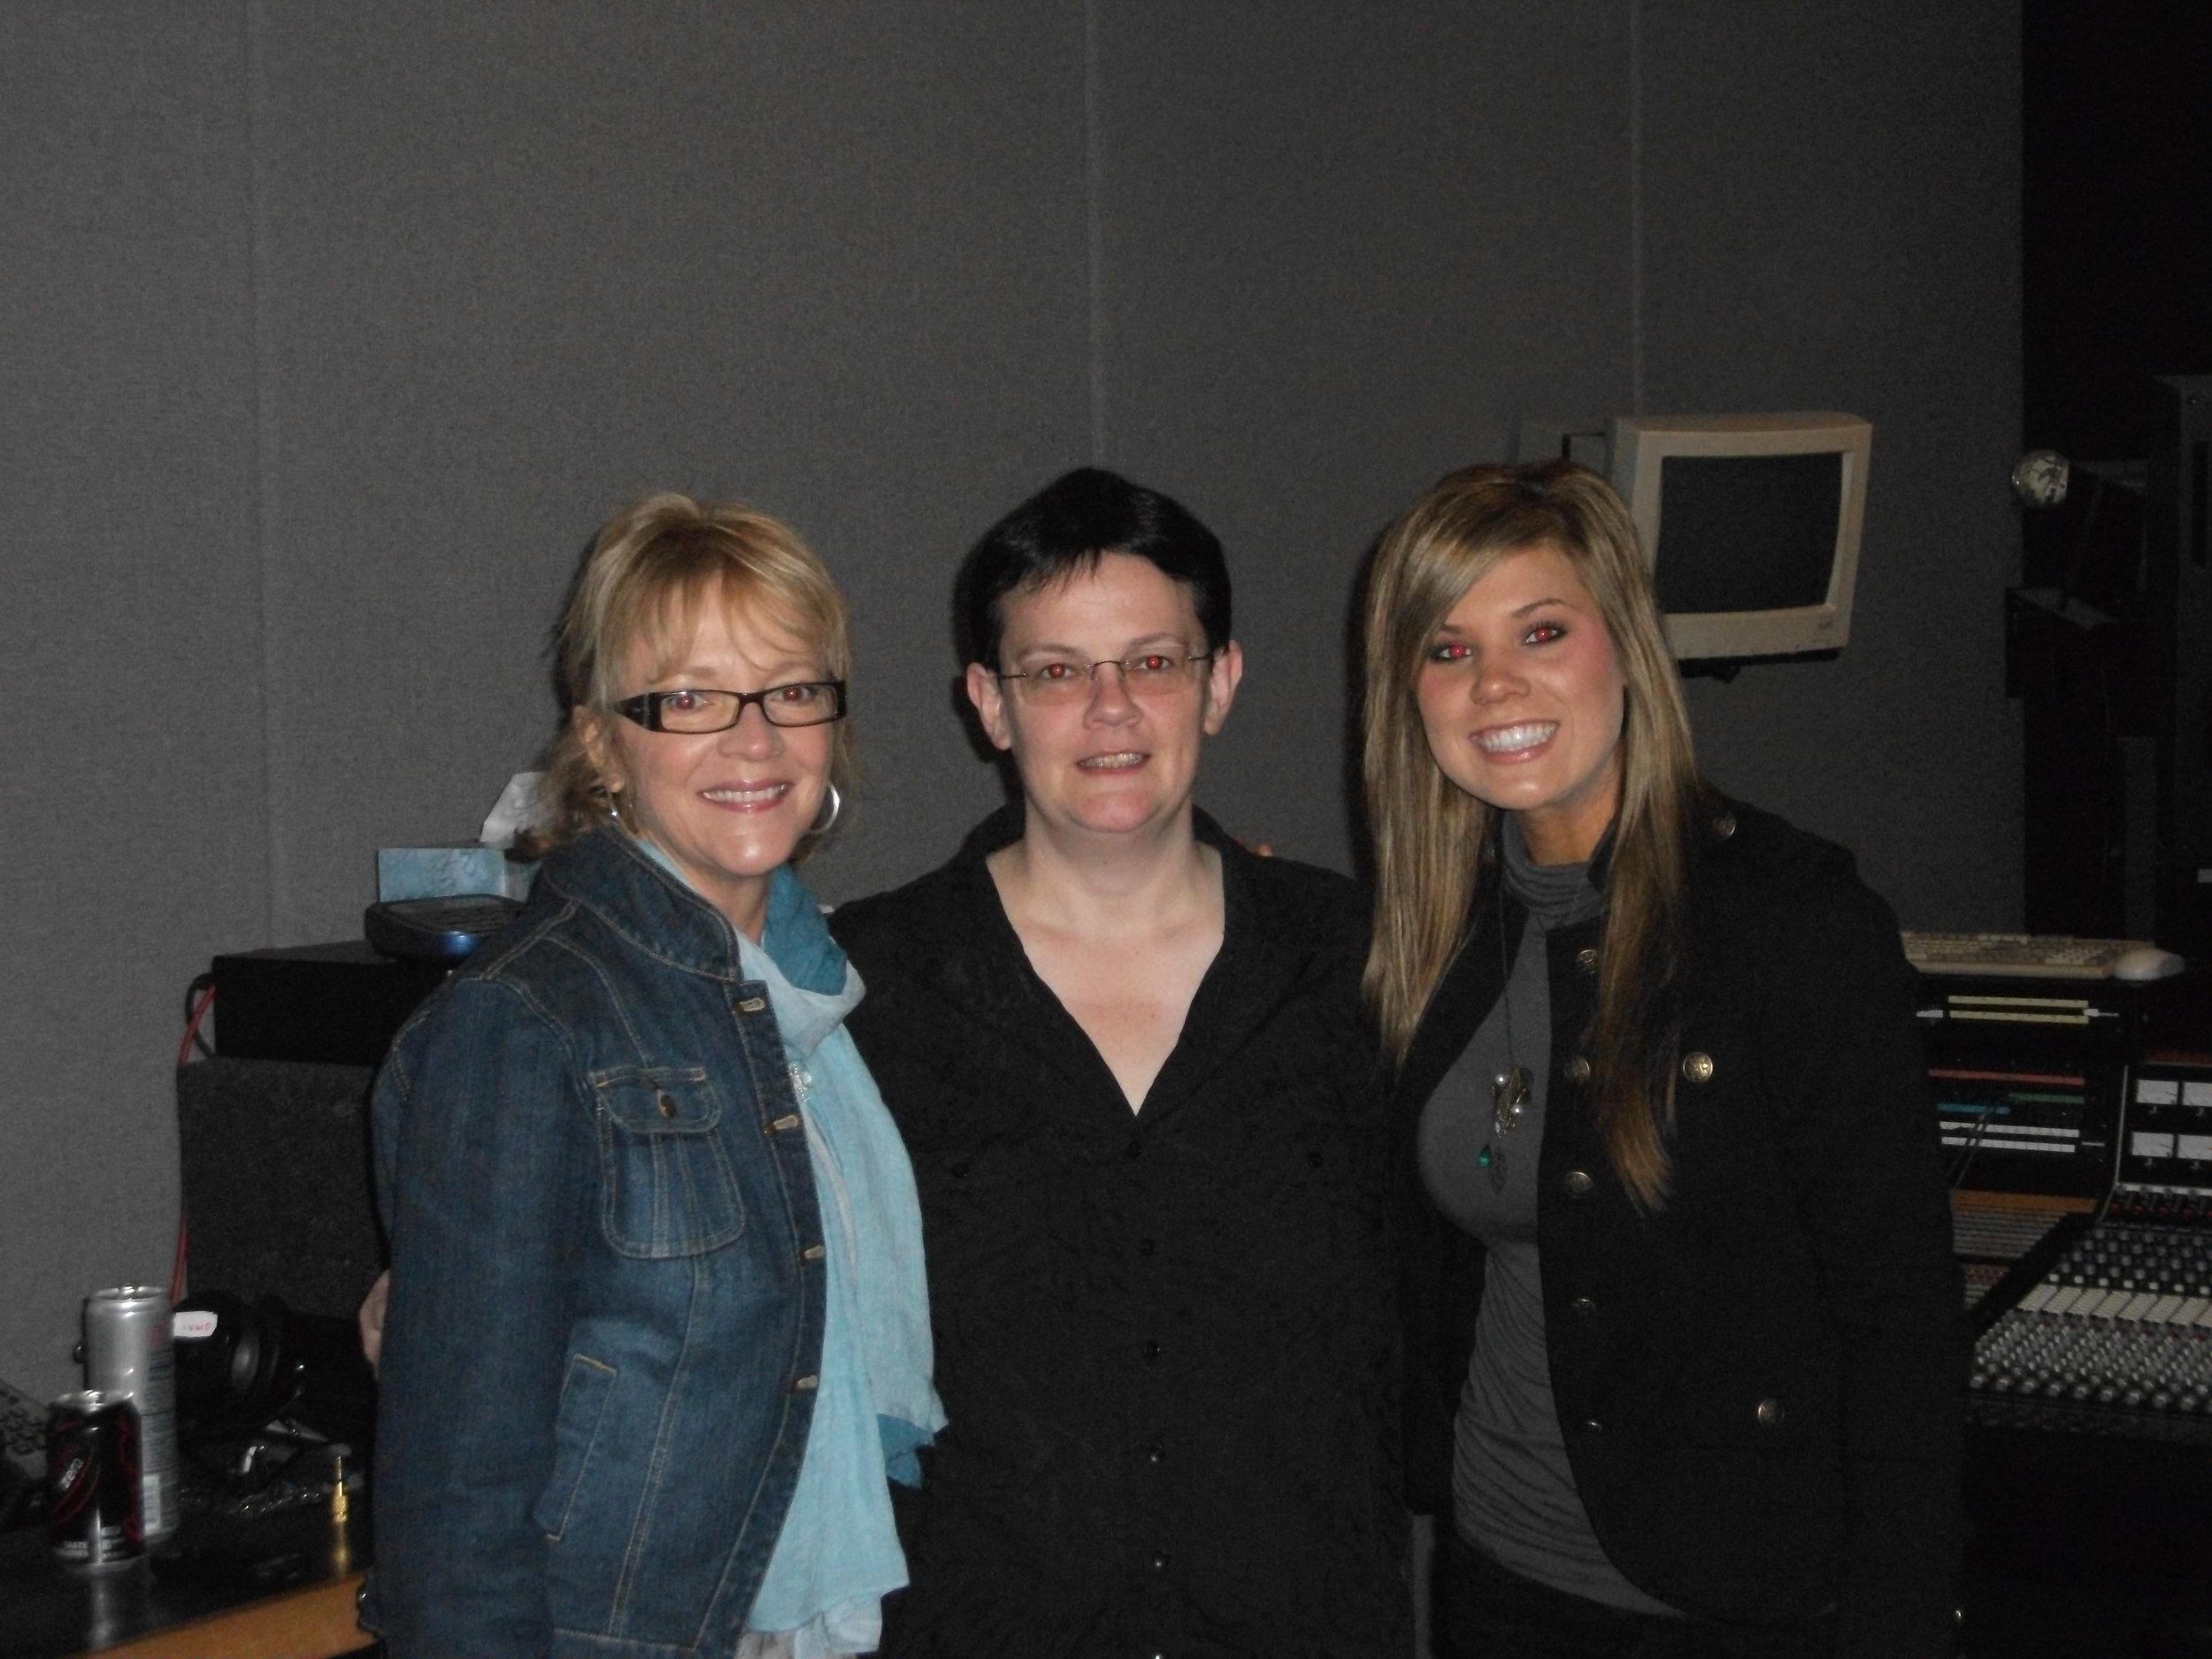 Ramona E. Simmons, Claudia Becker, and recording Artist Hope Nix at Omni Sound Studios, Nashville 2011.JPG